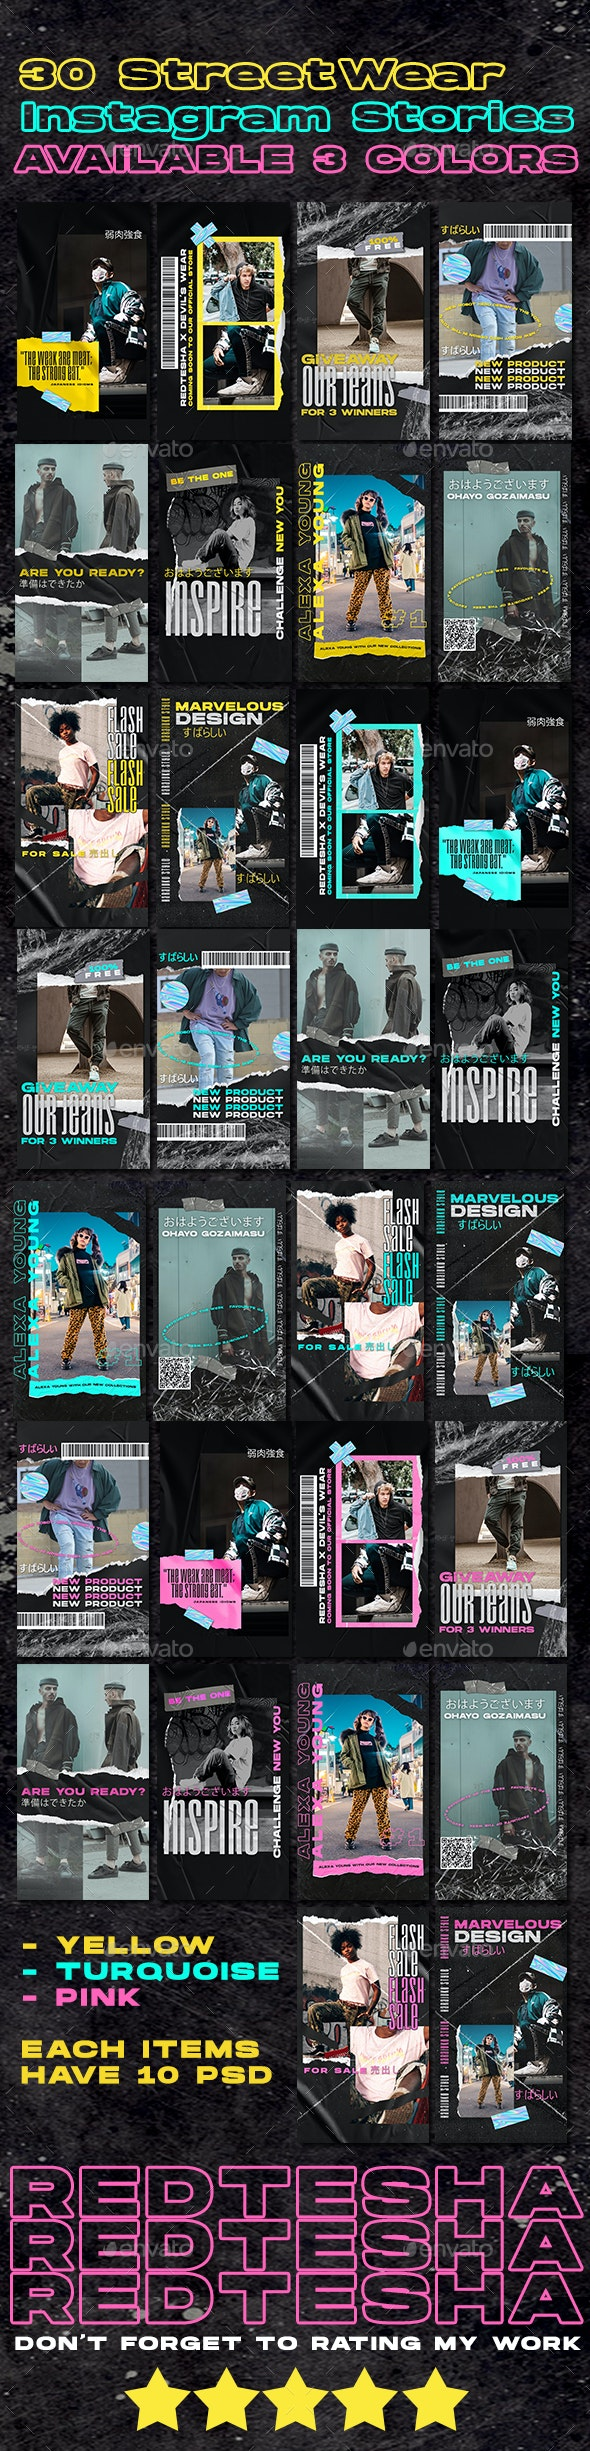 30 Japanese Streetwear Instagram Stories - Social Media Web Elements